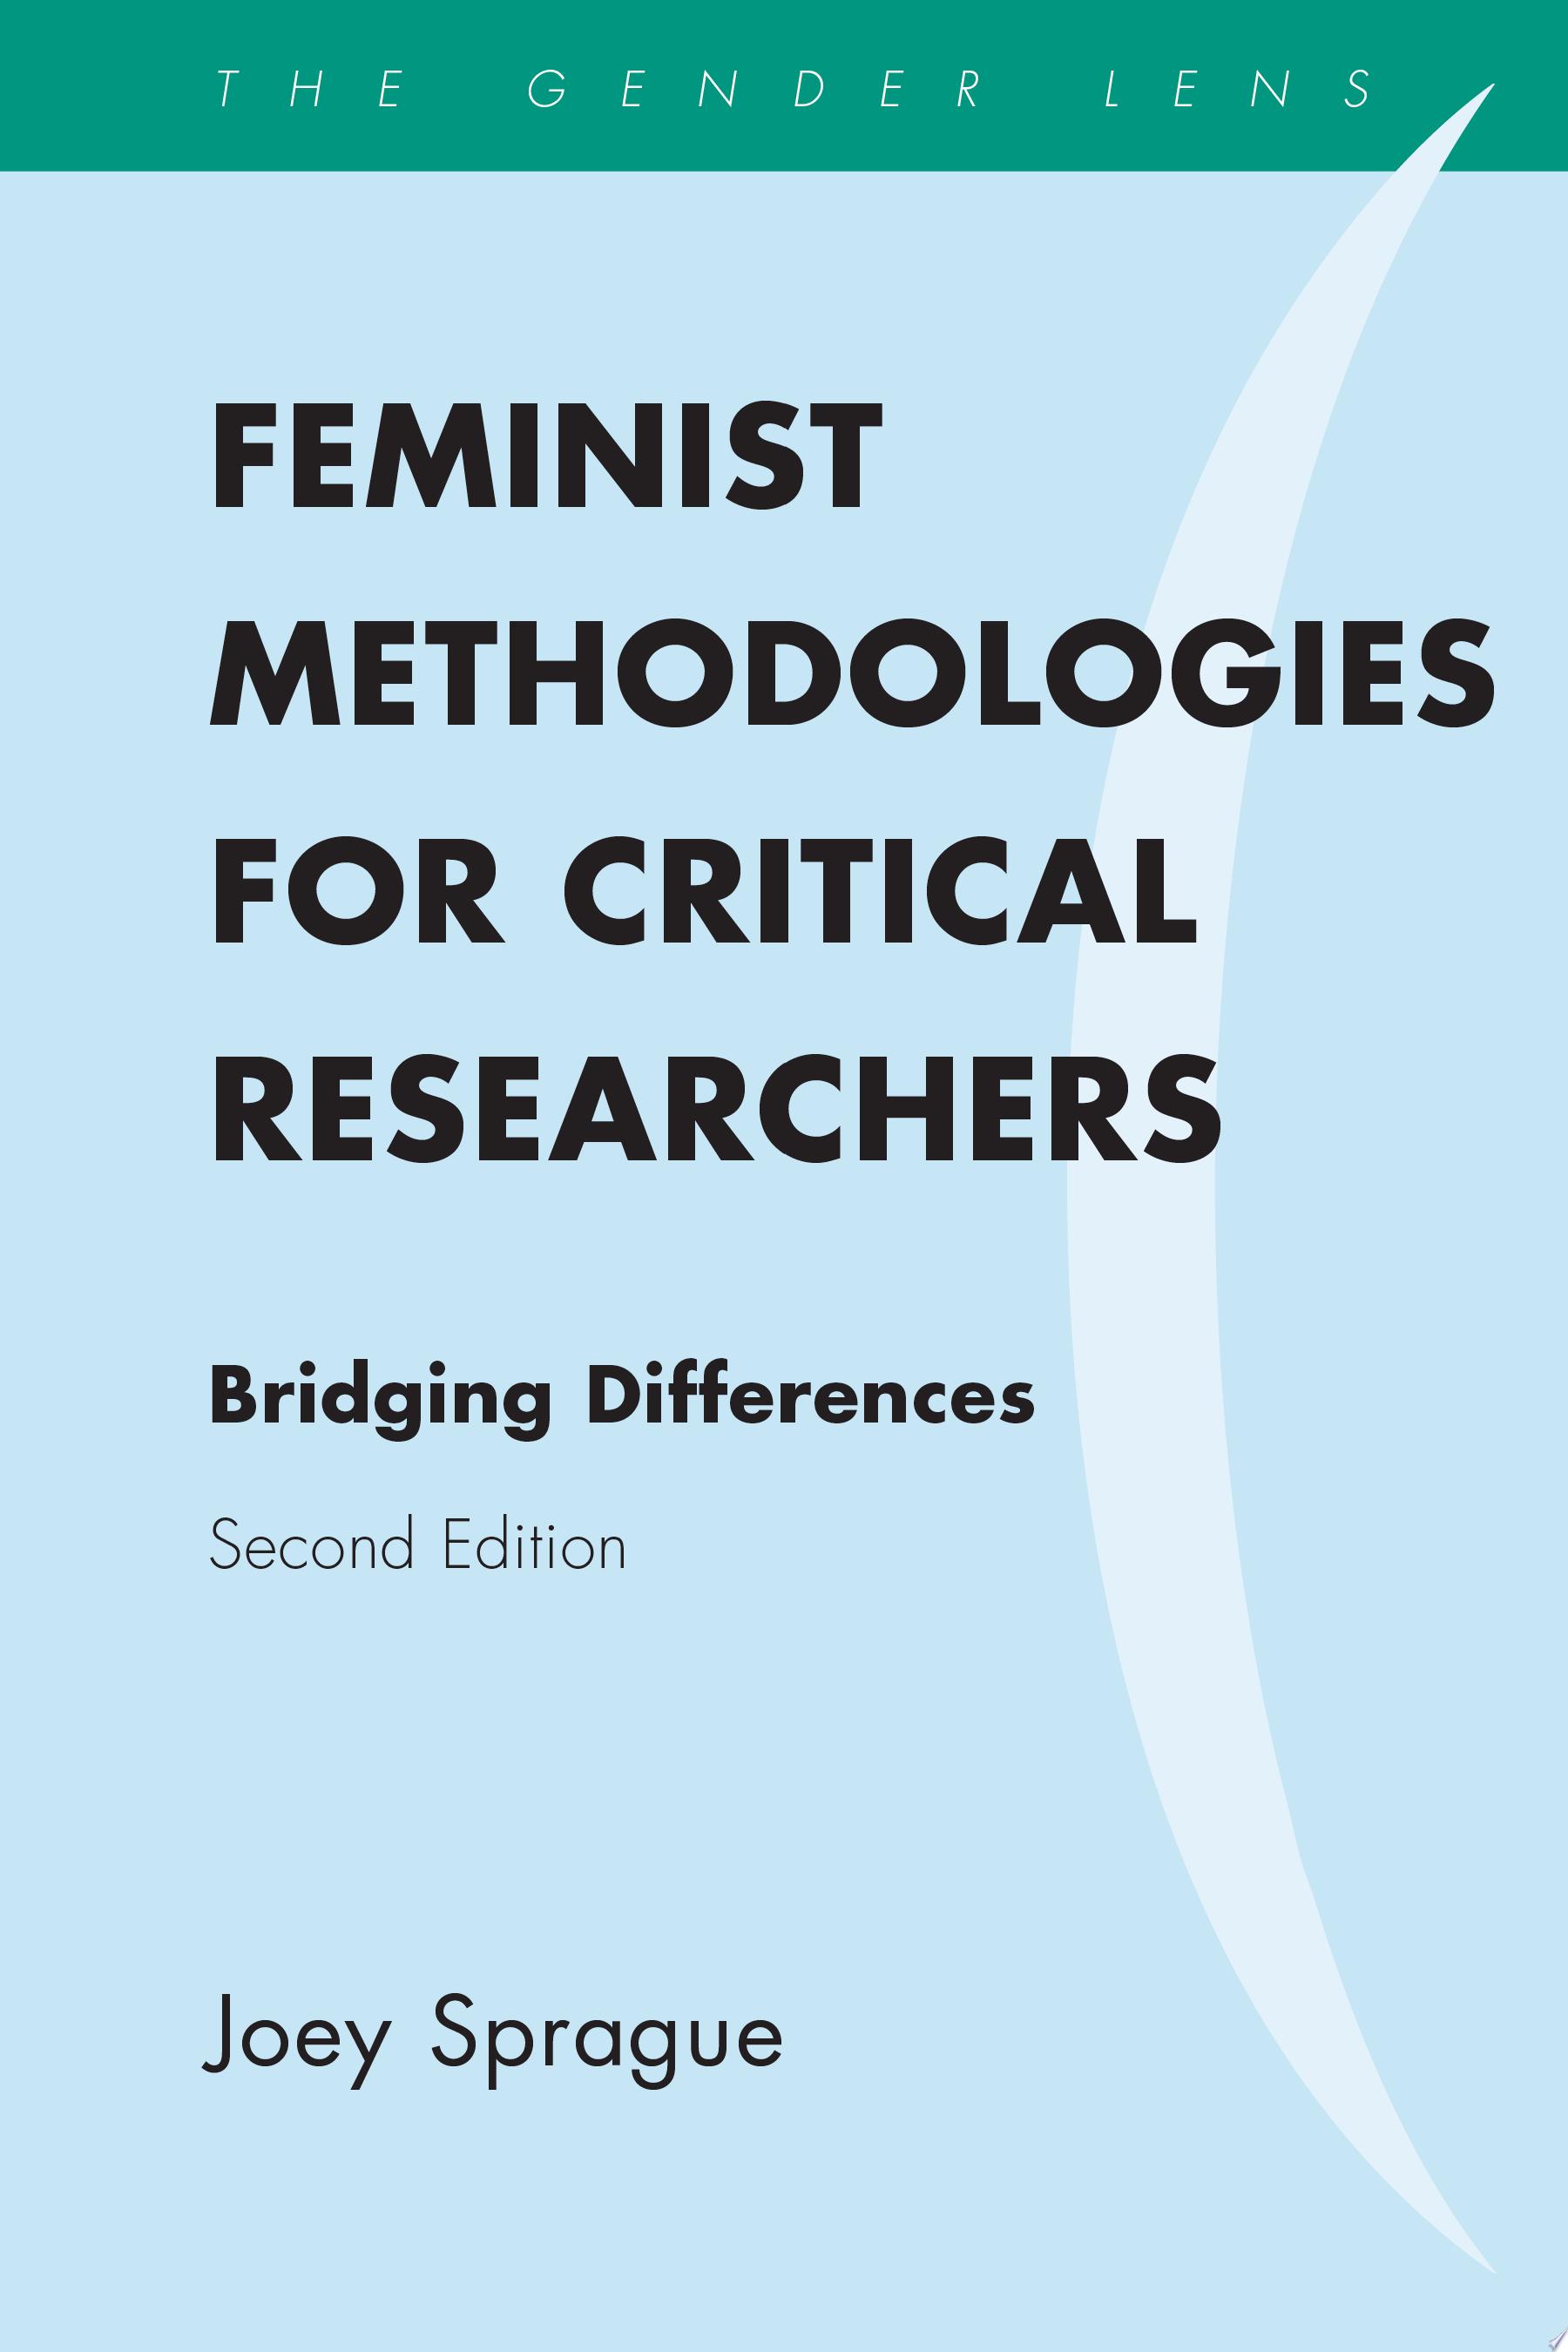 Feminist Methodologies for Critical Researchers